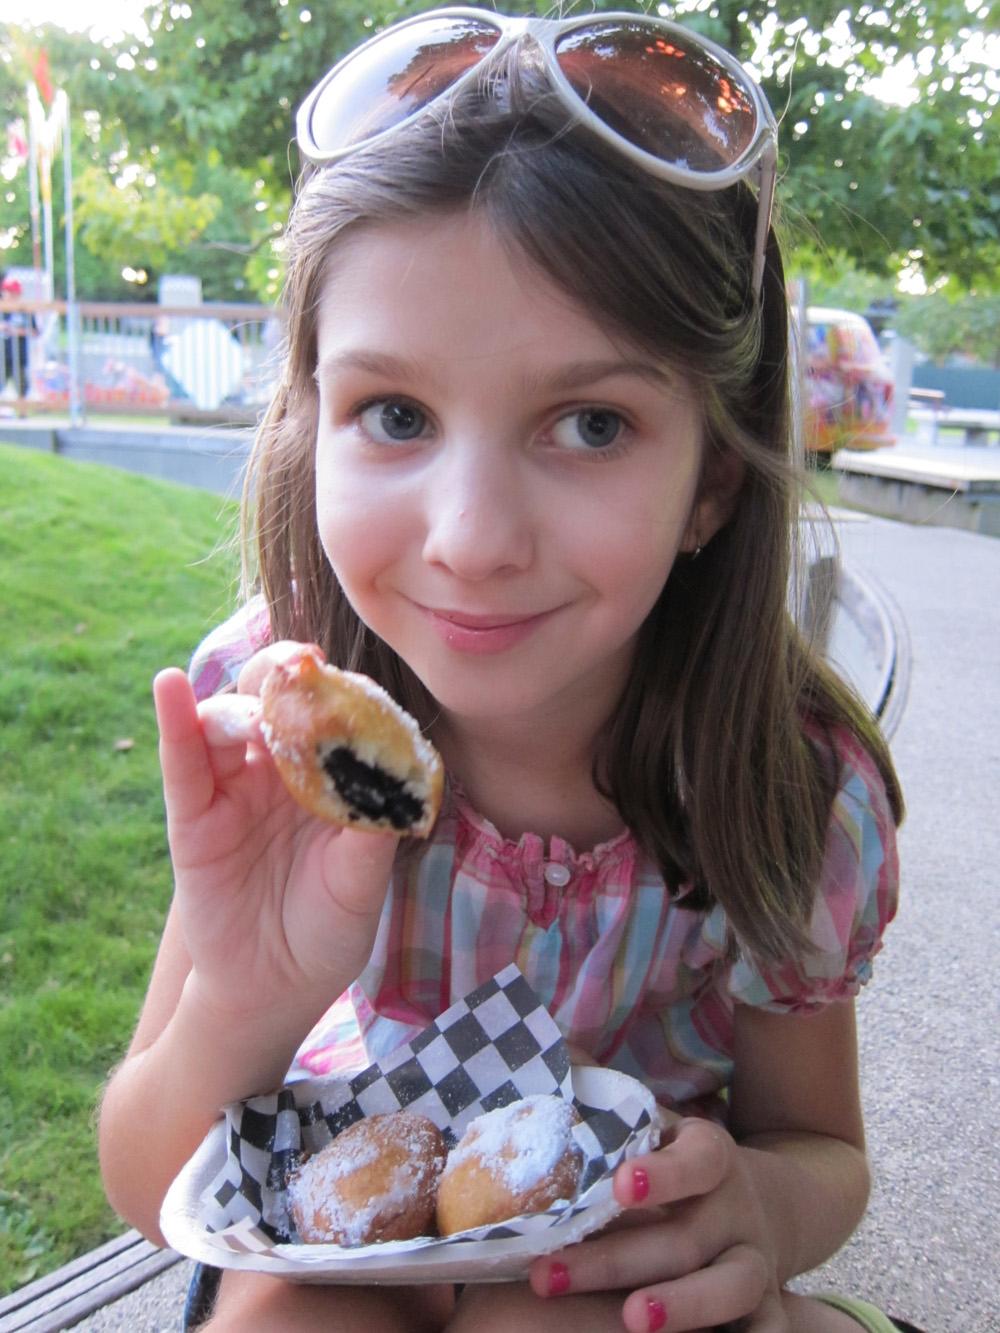 Symmie & Deep-Fried Oreos